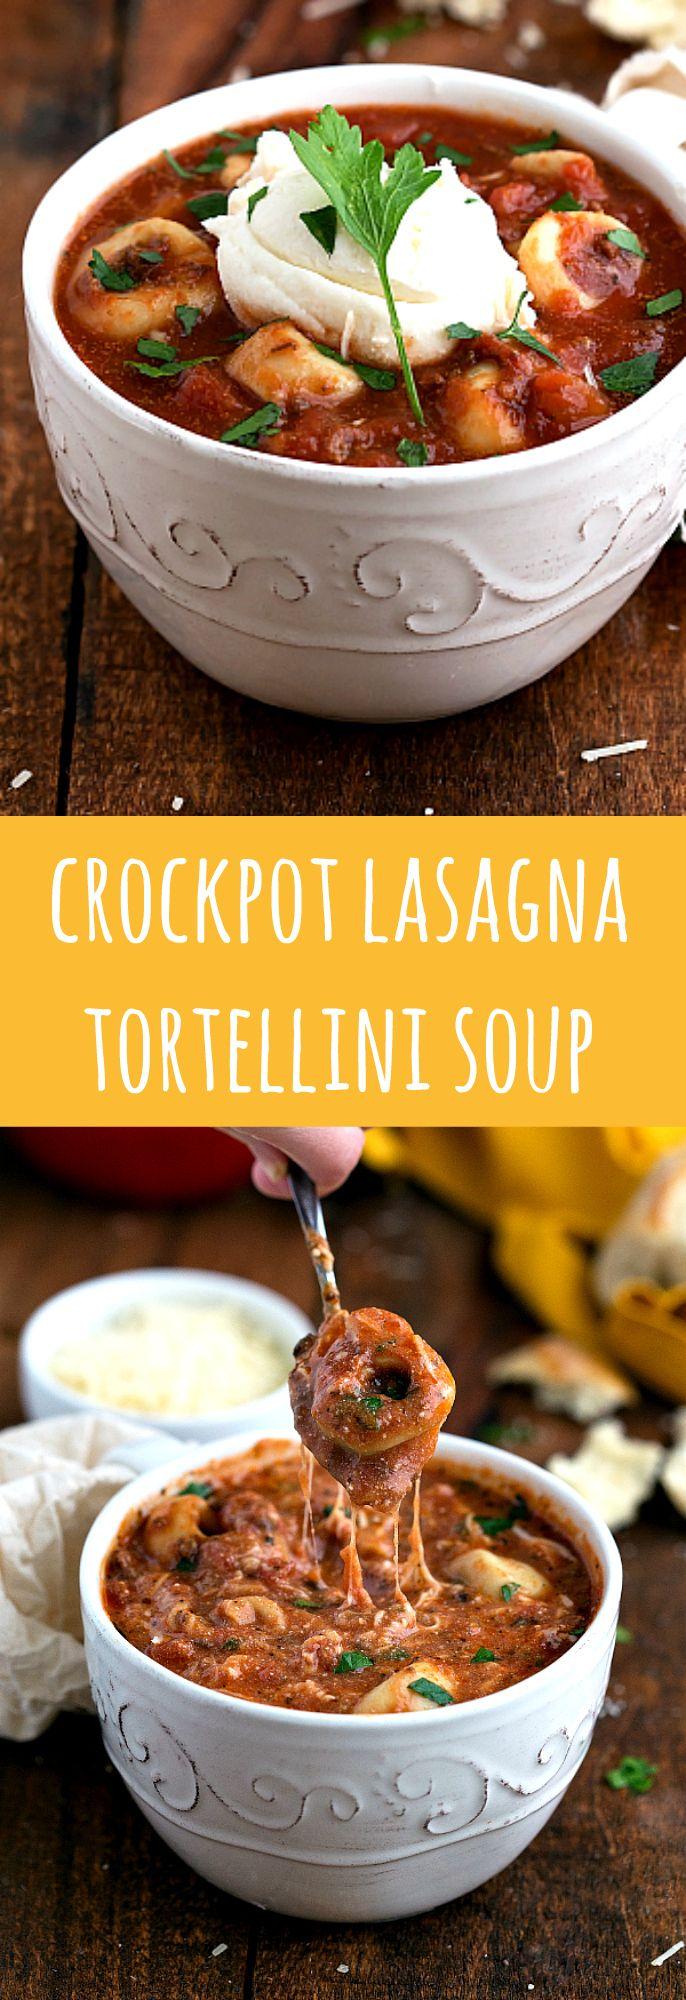 Delicious and simple CROCKPOT tortellini lasagna soup